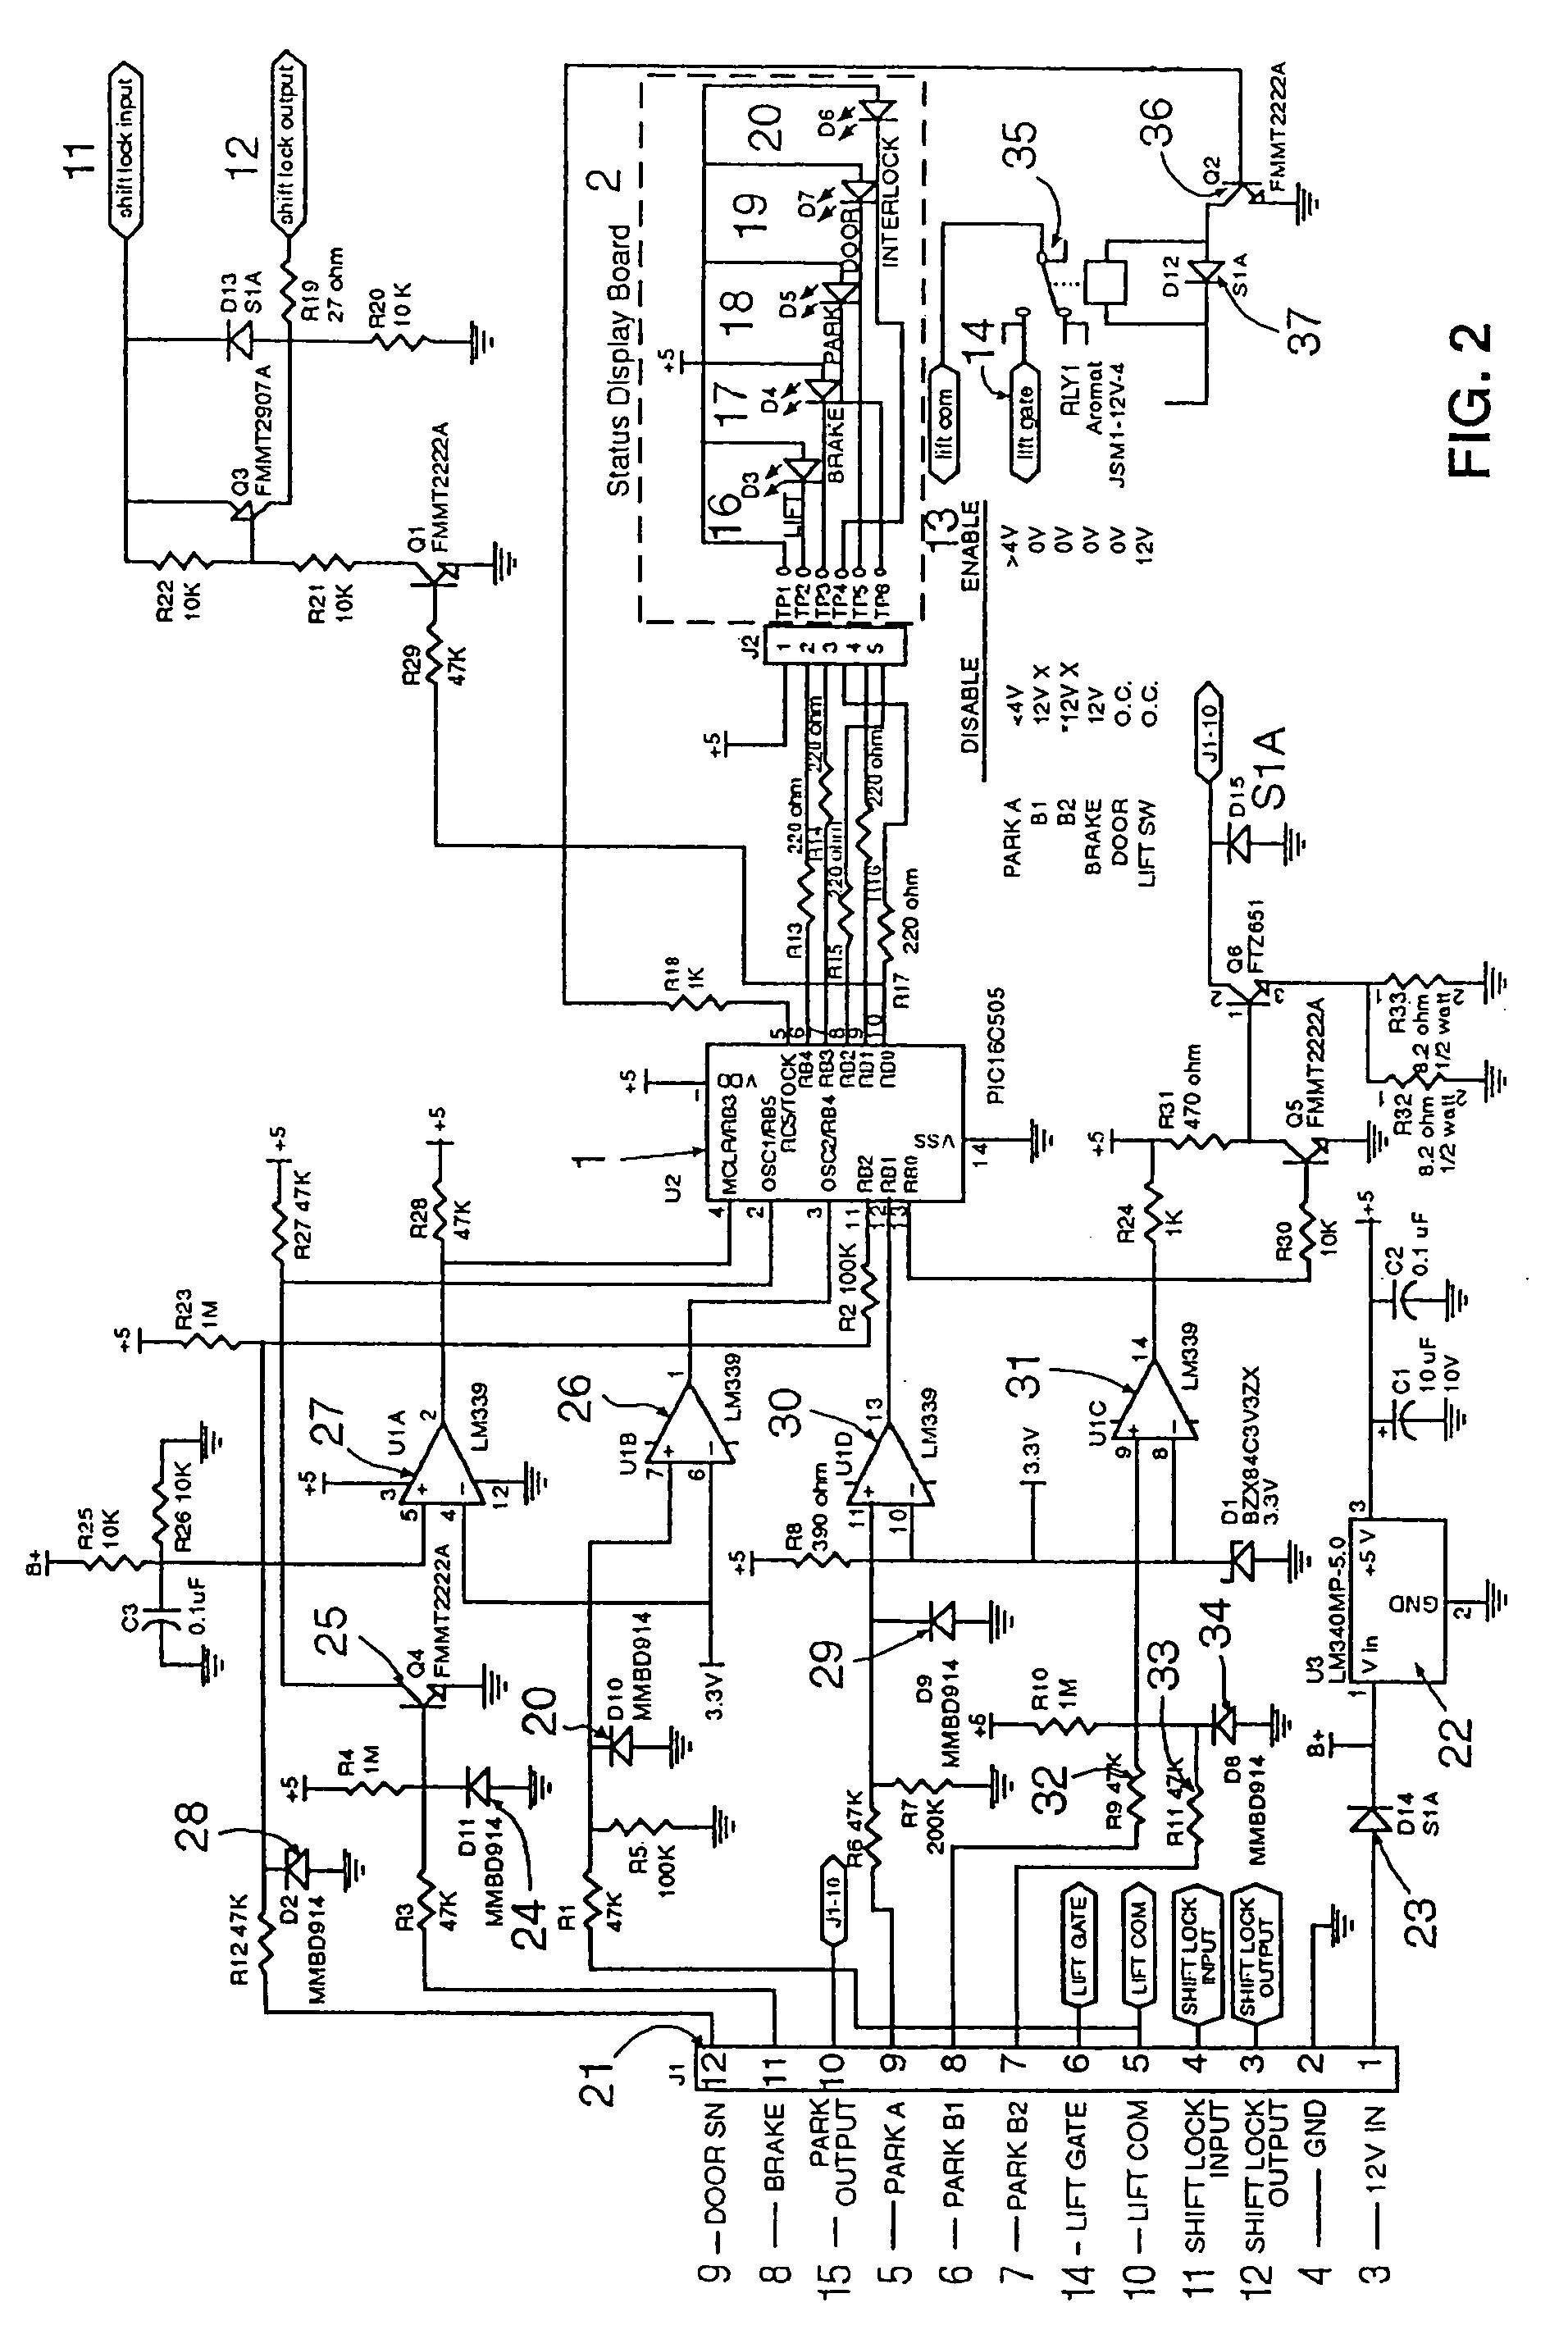 patent us7274980 - intelligent lift interlock system